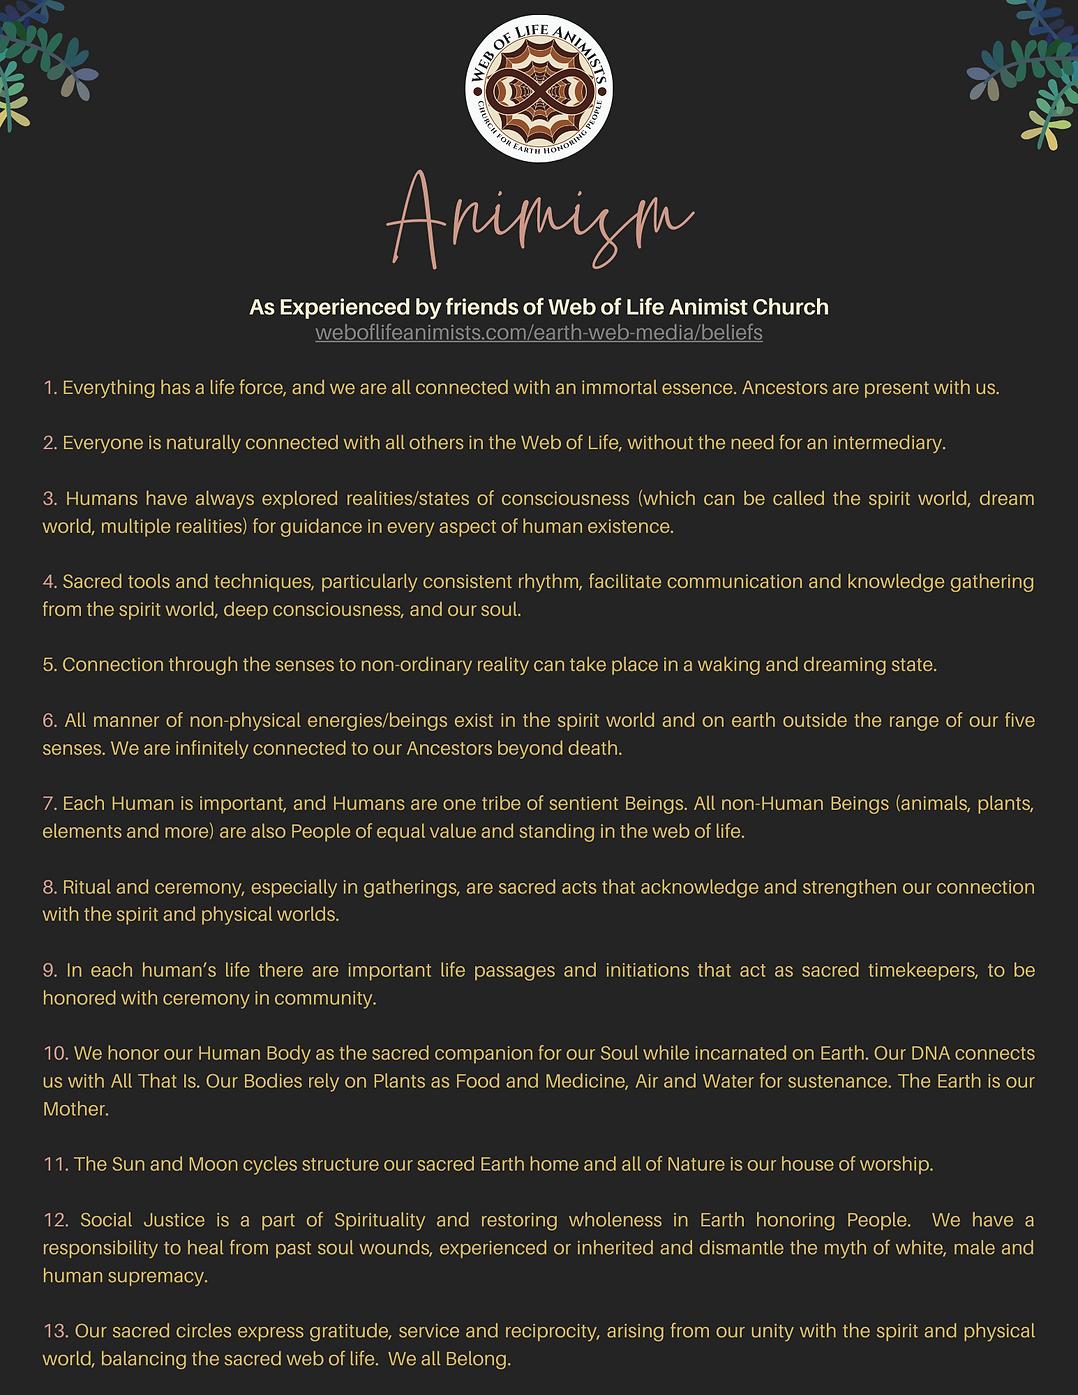 animism statement.png